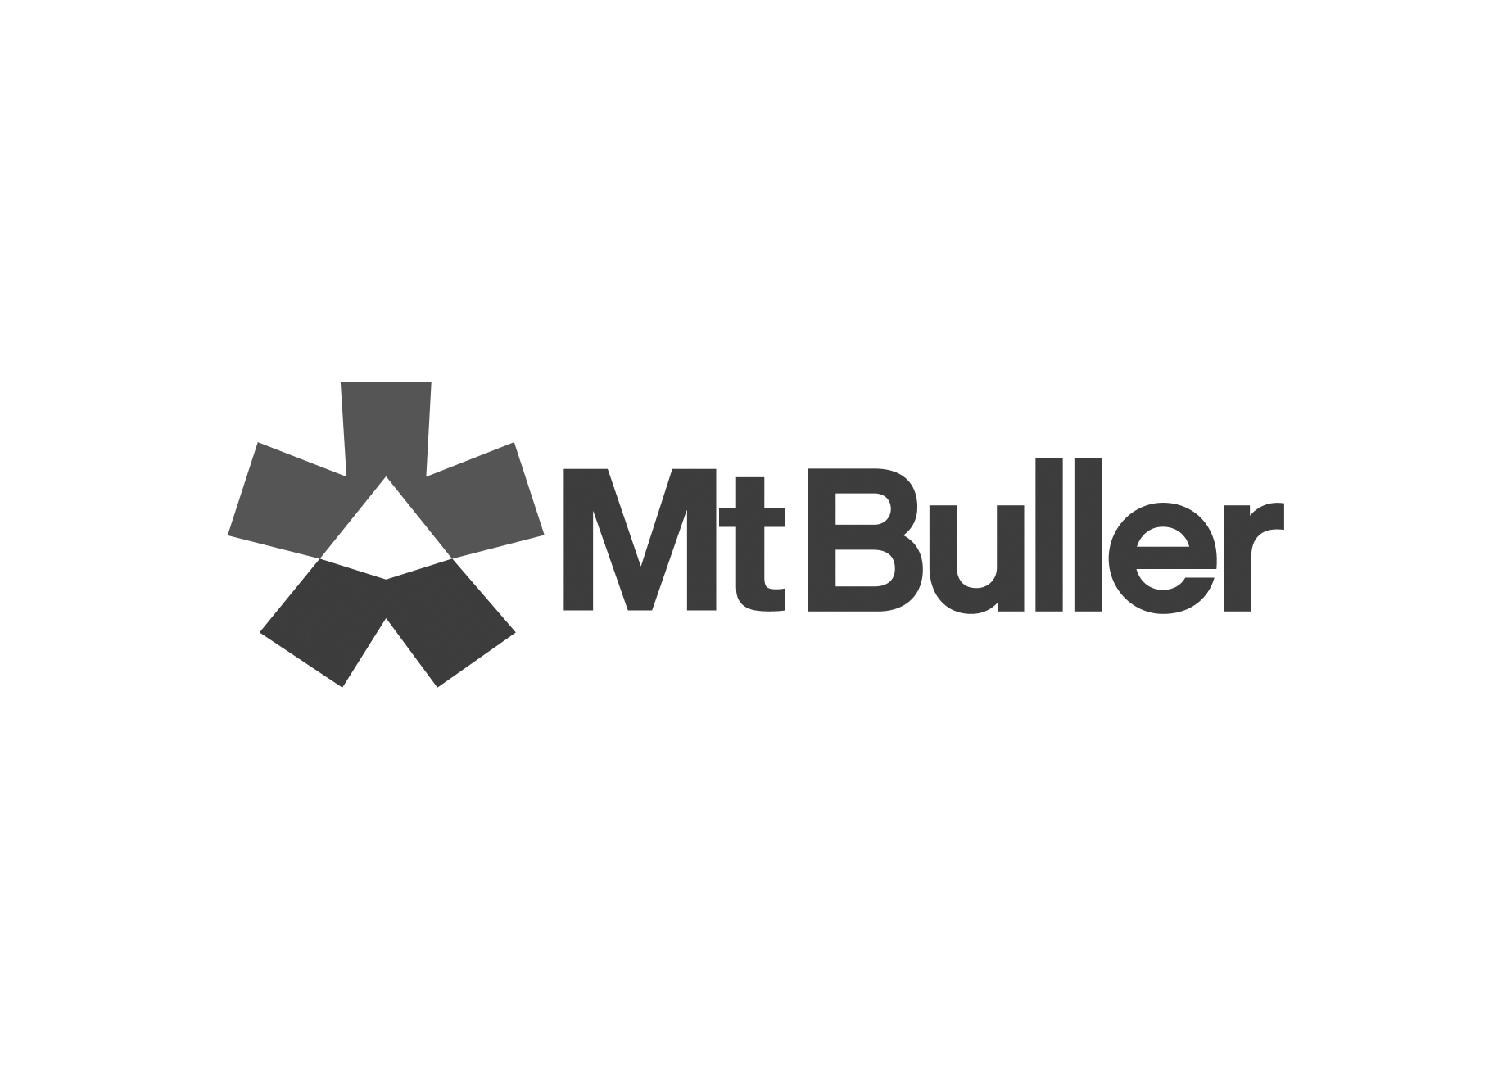 Mt Buller-01.jpg